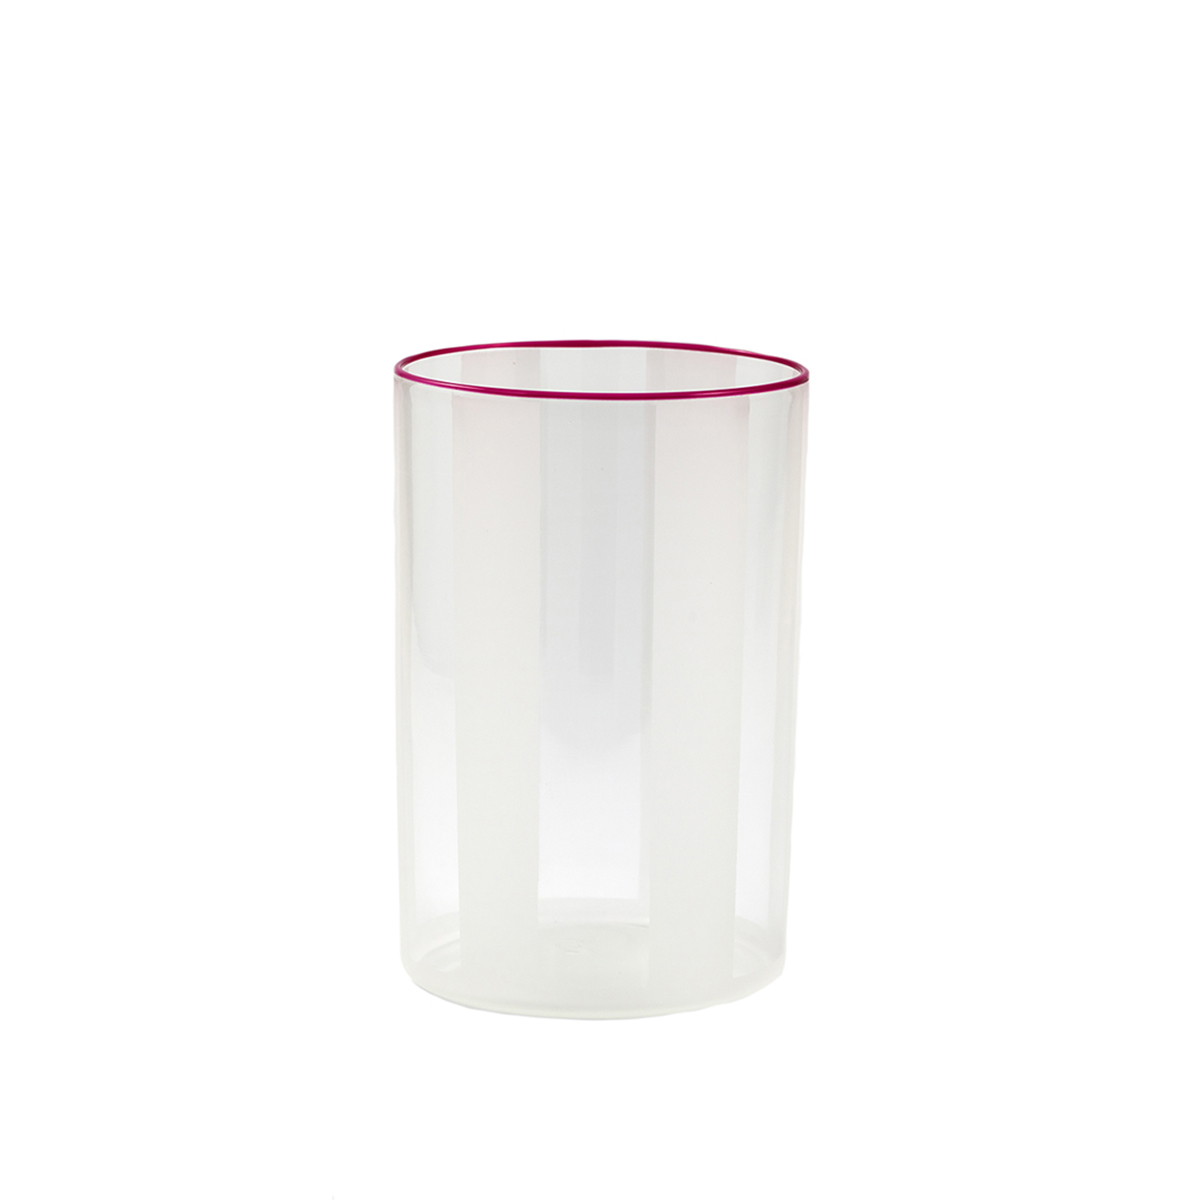 strica_wine_vertical_lines_glass_murano_design_giberto_handmade_venice